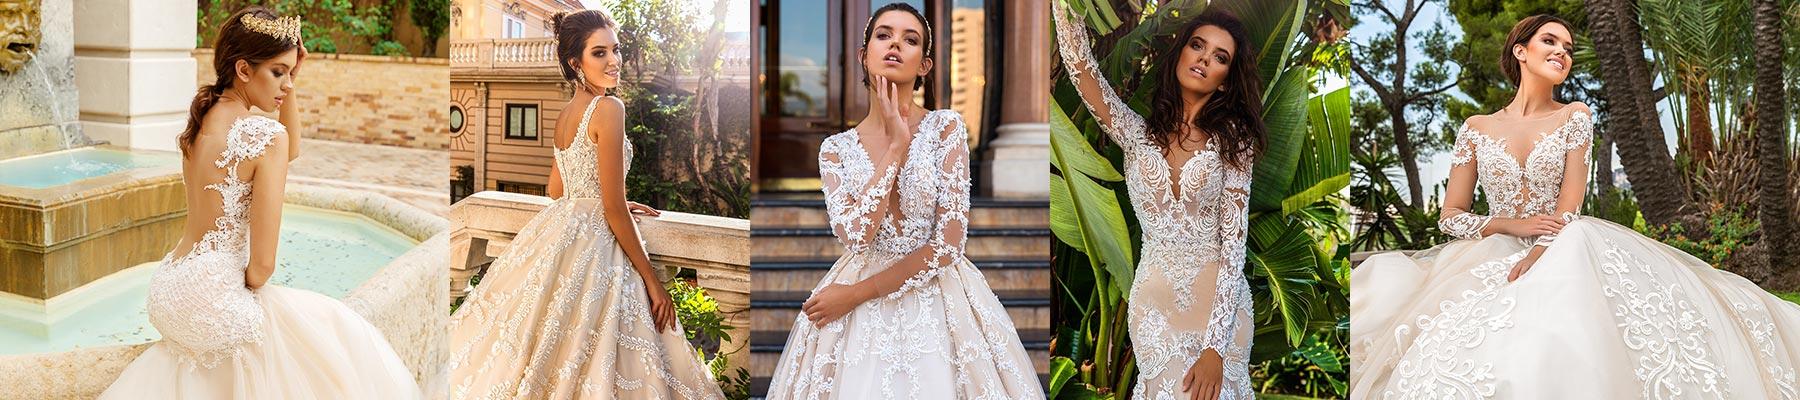 Wedding Dresses Frisco Tx 93 Inspirational Crystal Design Wedding Dresses